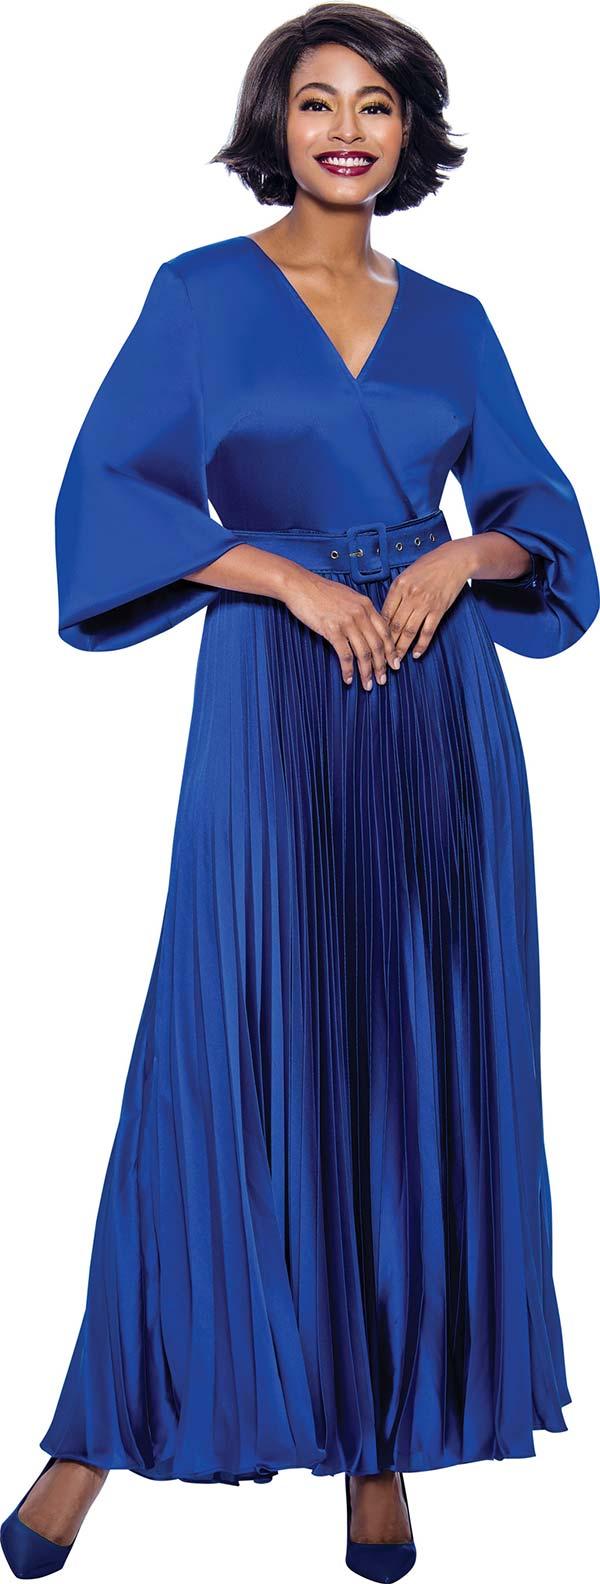 Terramina 7812-Royal - Accordion Pleated Vee Neckline Dress With Bishop Sleeves & Belt